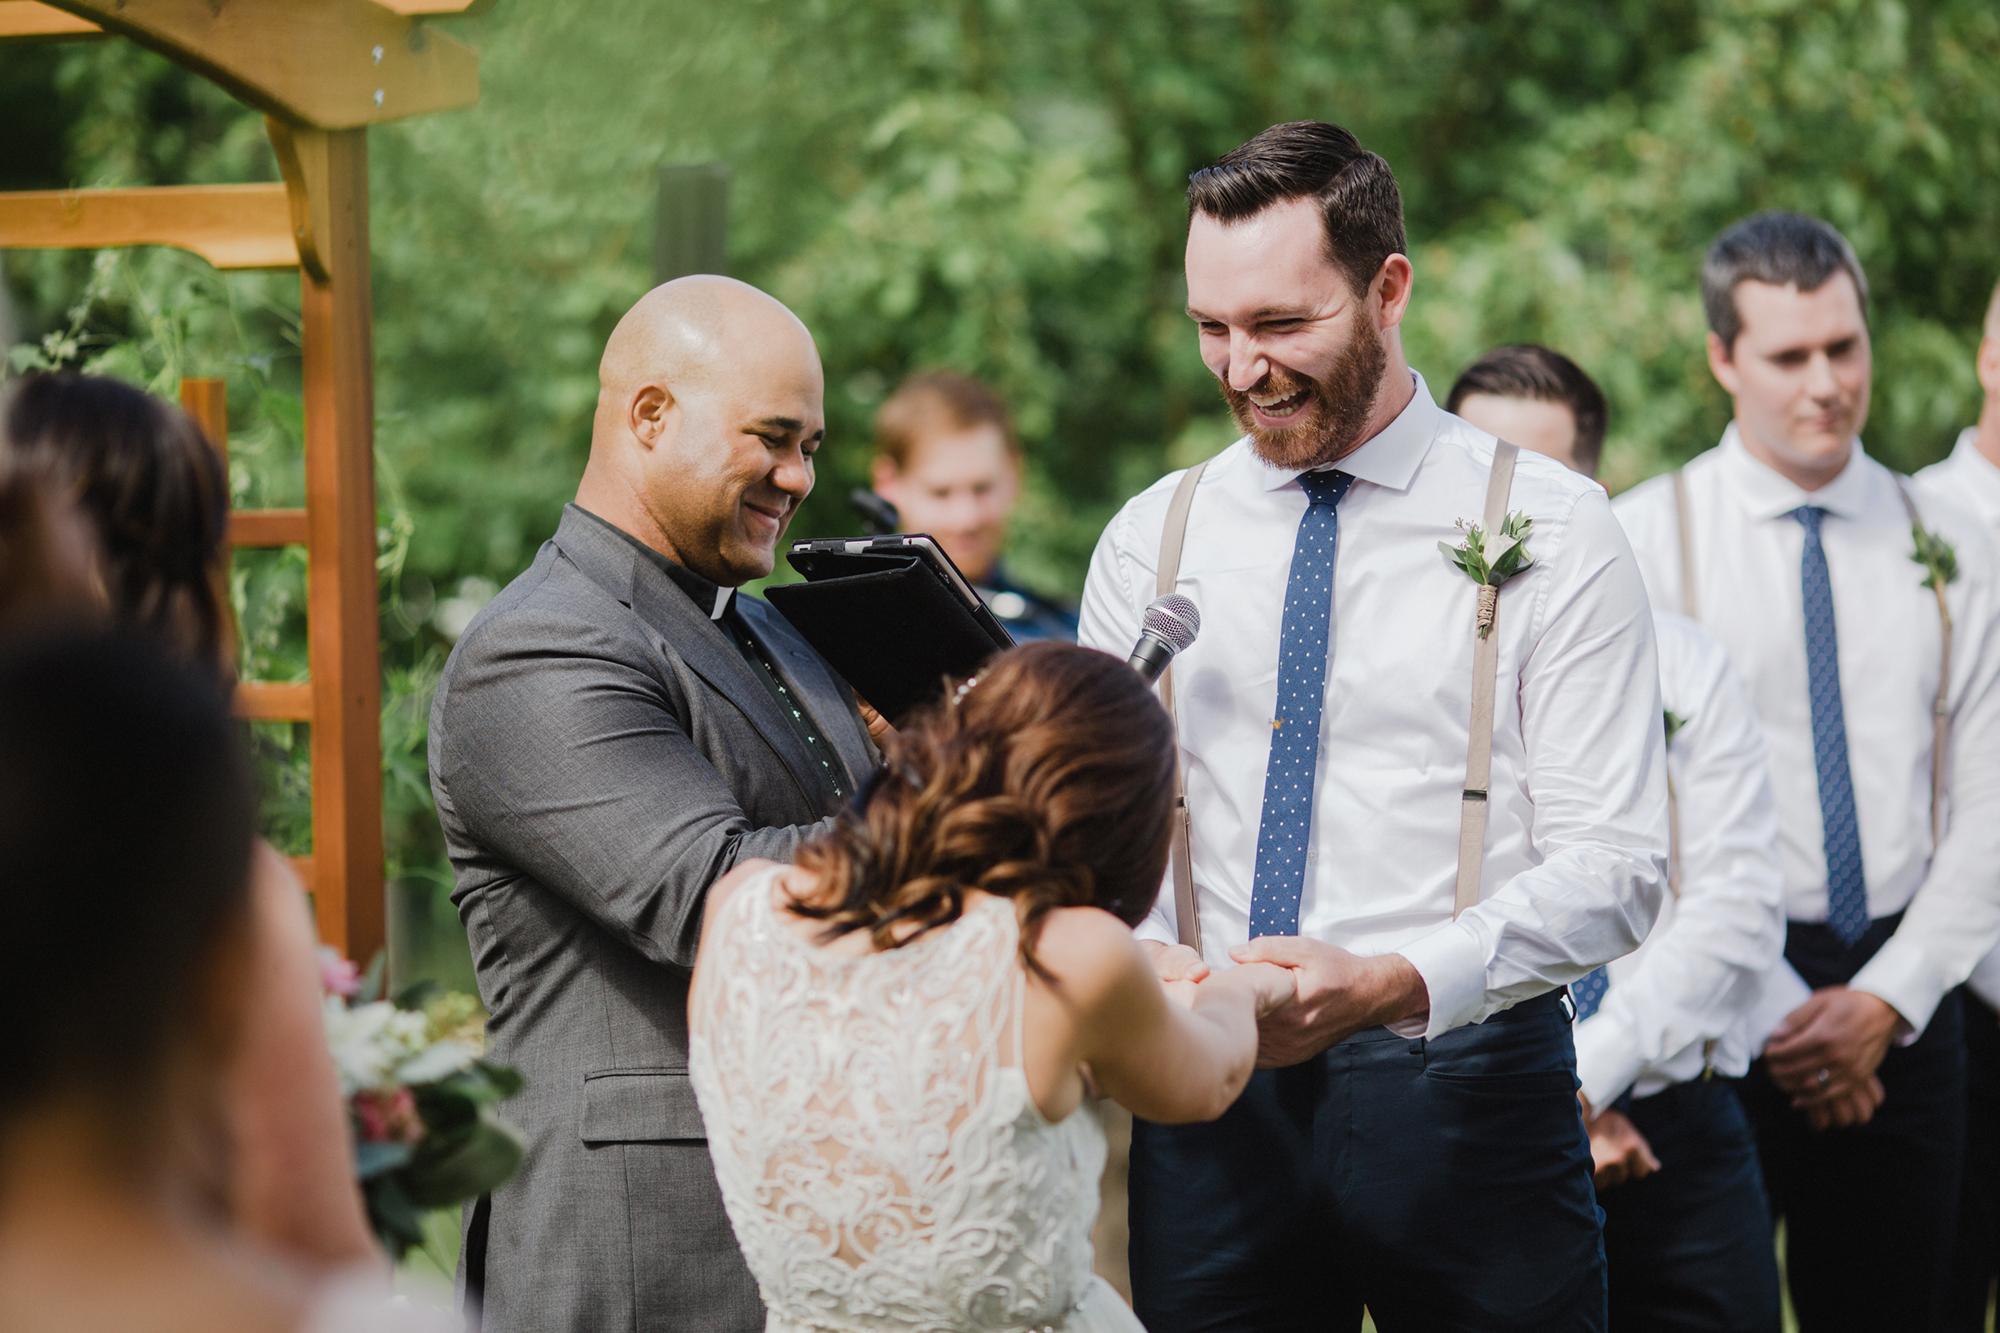 Flower Farm Crowsnest Pass Wedding -056.JPG